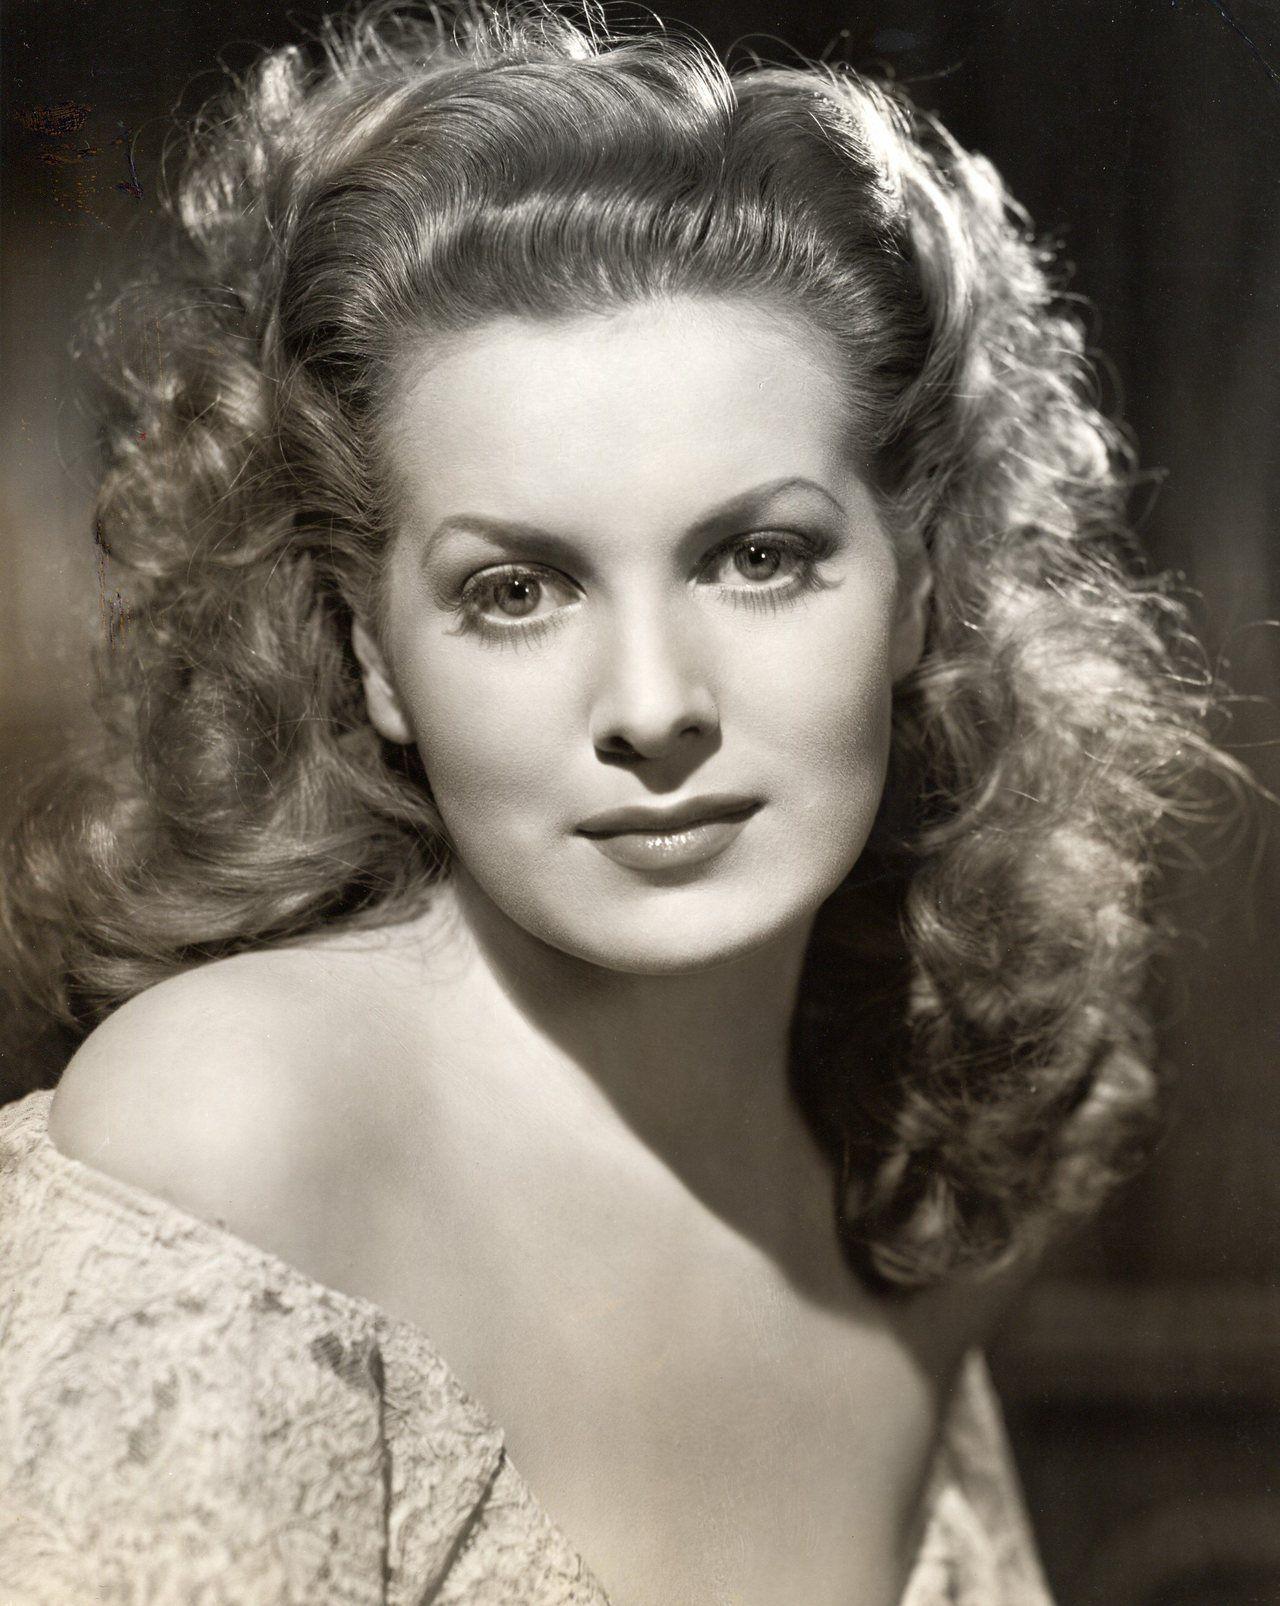 Vintage actress galleries 67